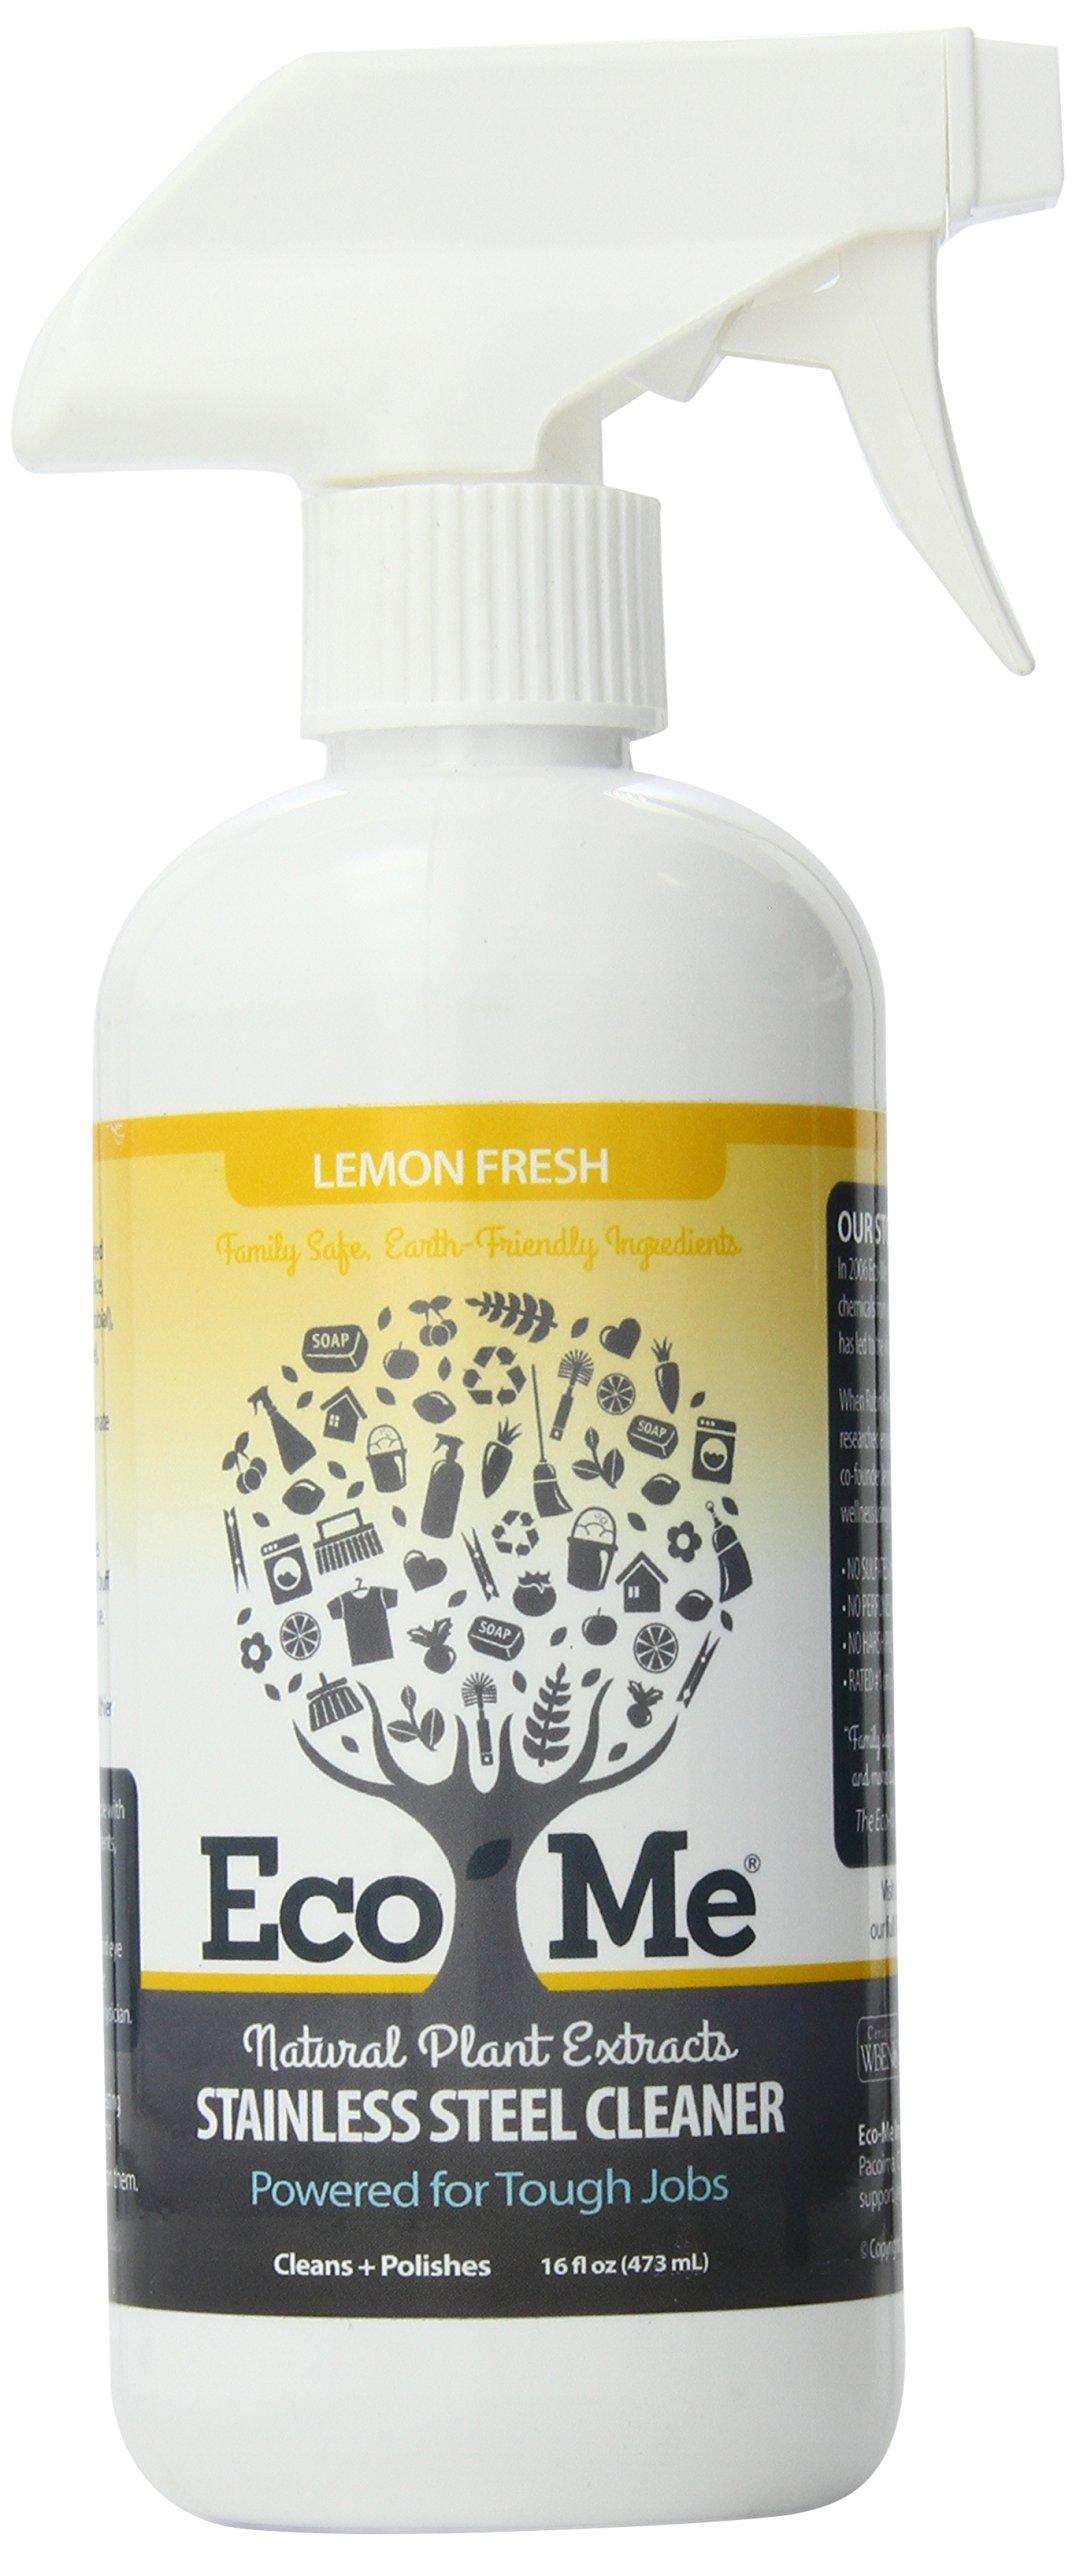 Eco-Me Natural Stainless Steel Cleaner, Lemon Fresh, 16 Fluid Ounce